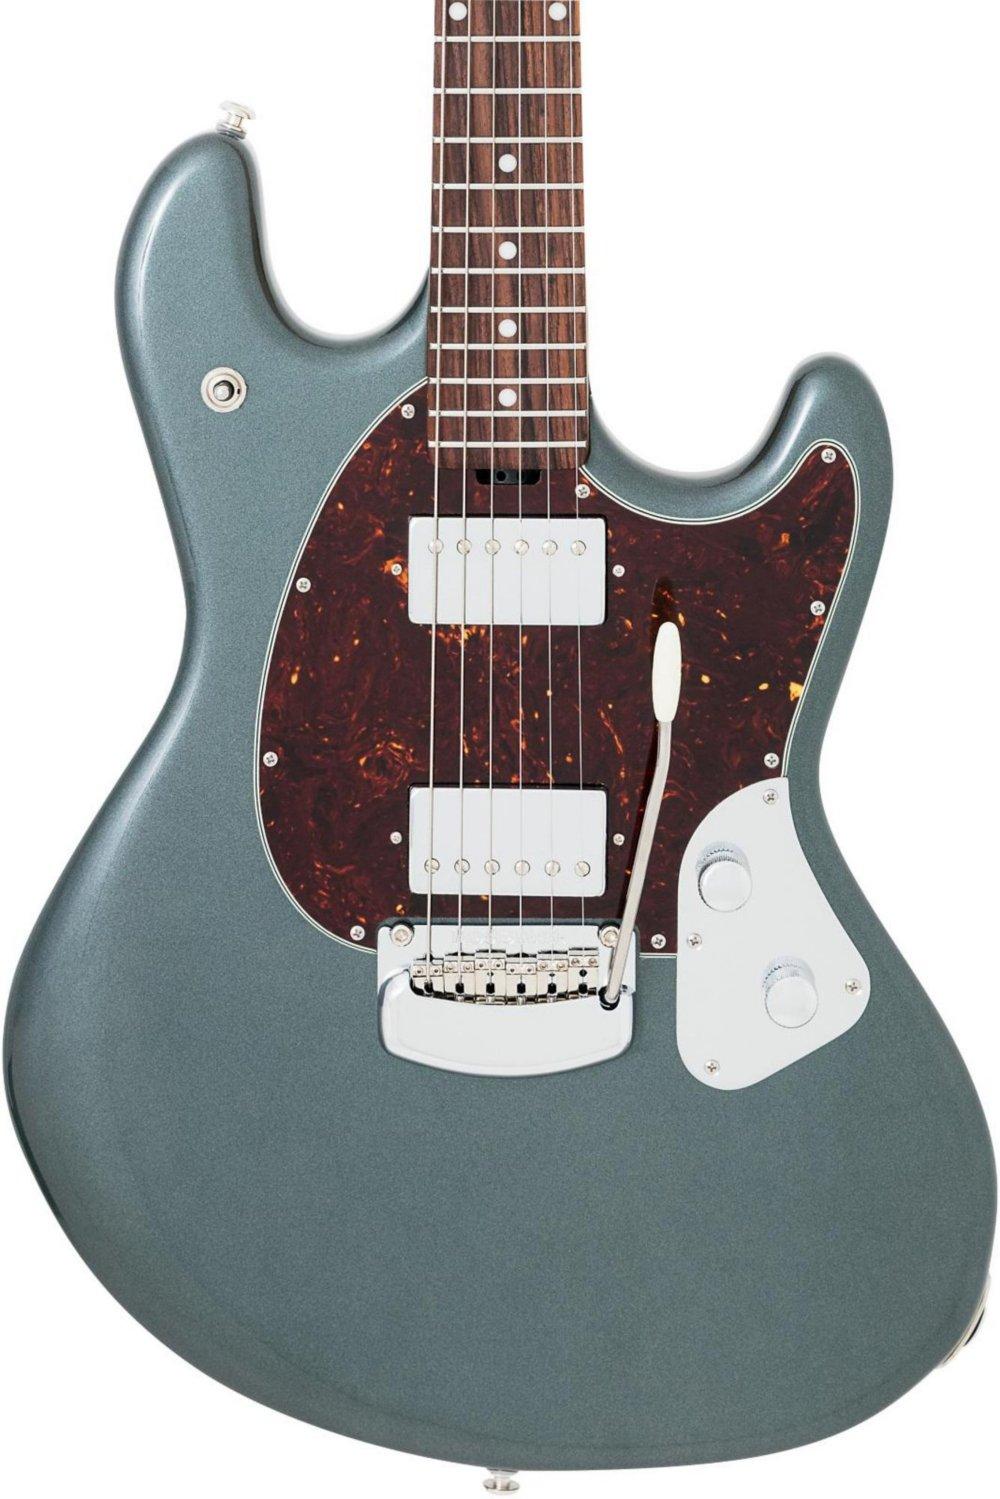 Ernie Ball Music Man StingRay Guitar - Charcoal Frost